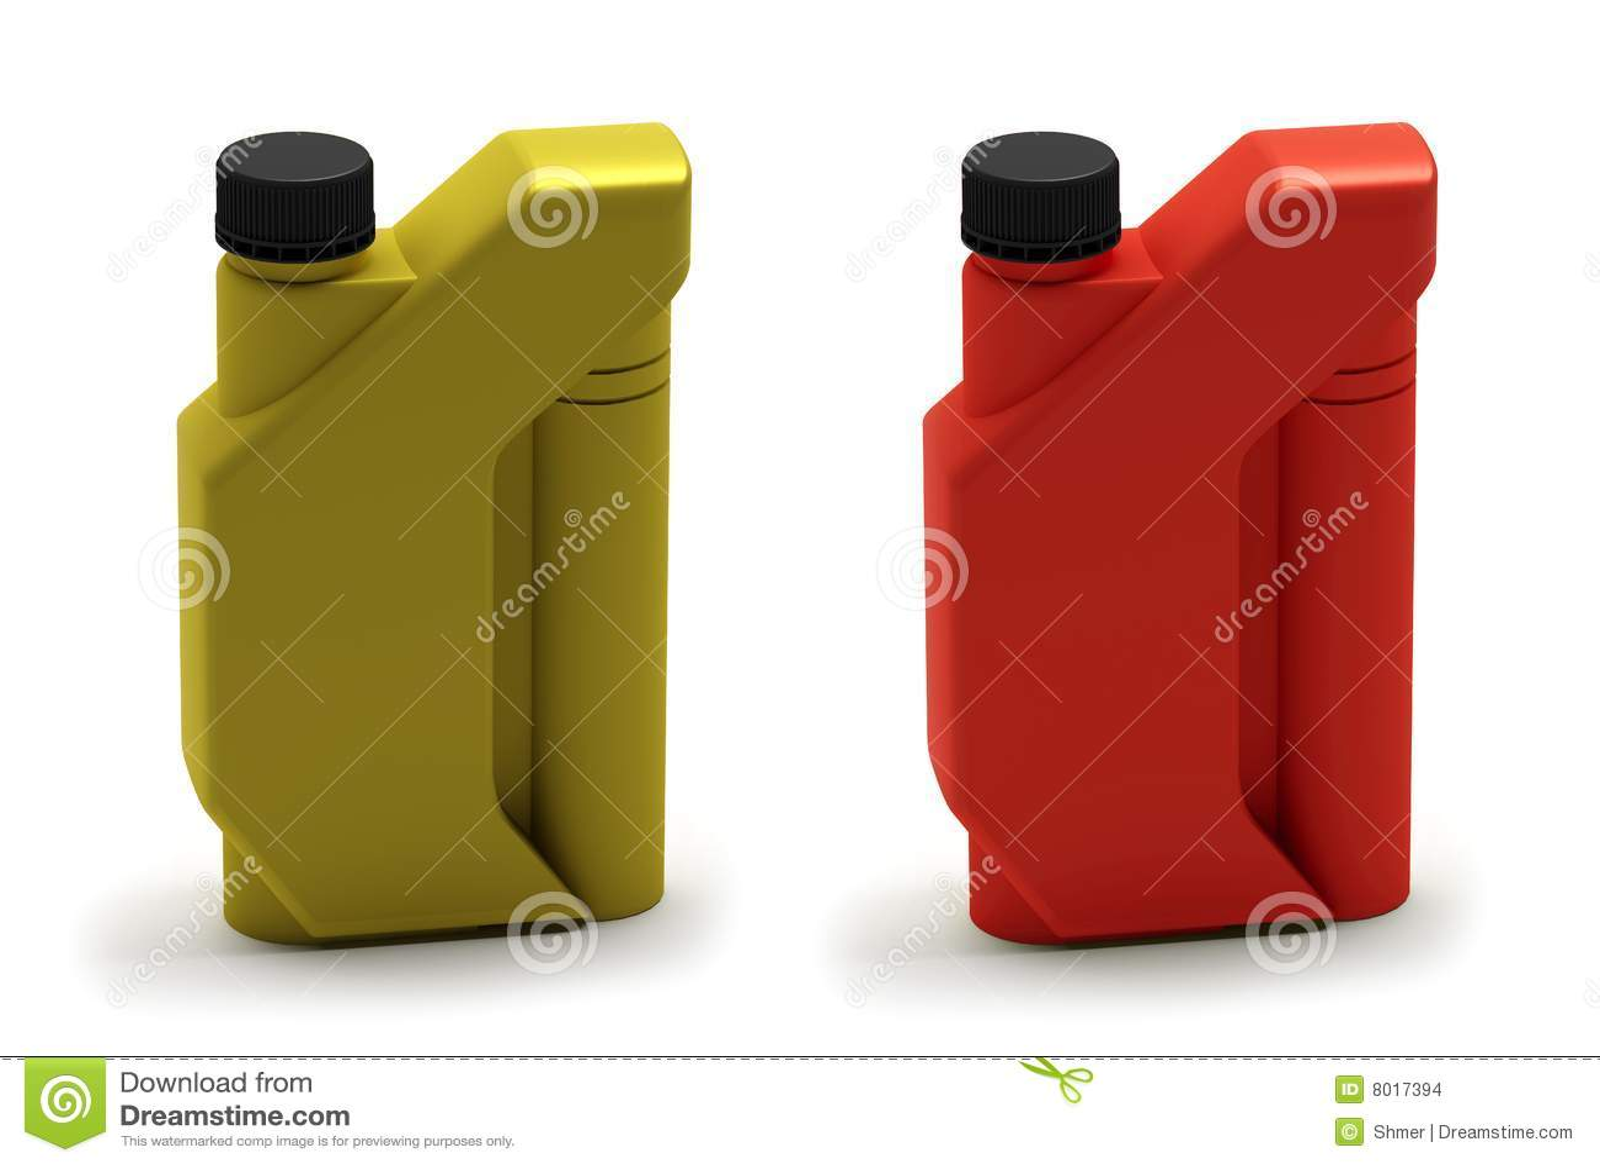 Canister motor oil bottle stock images image 8017394 for Motor oil plastic bottle manufacturer